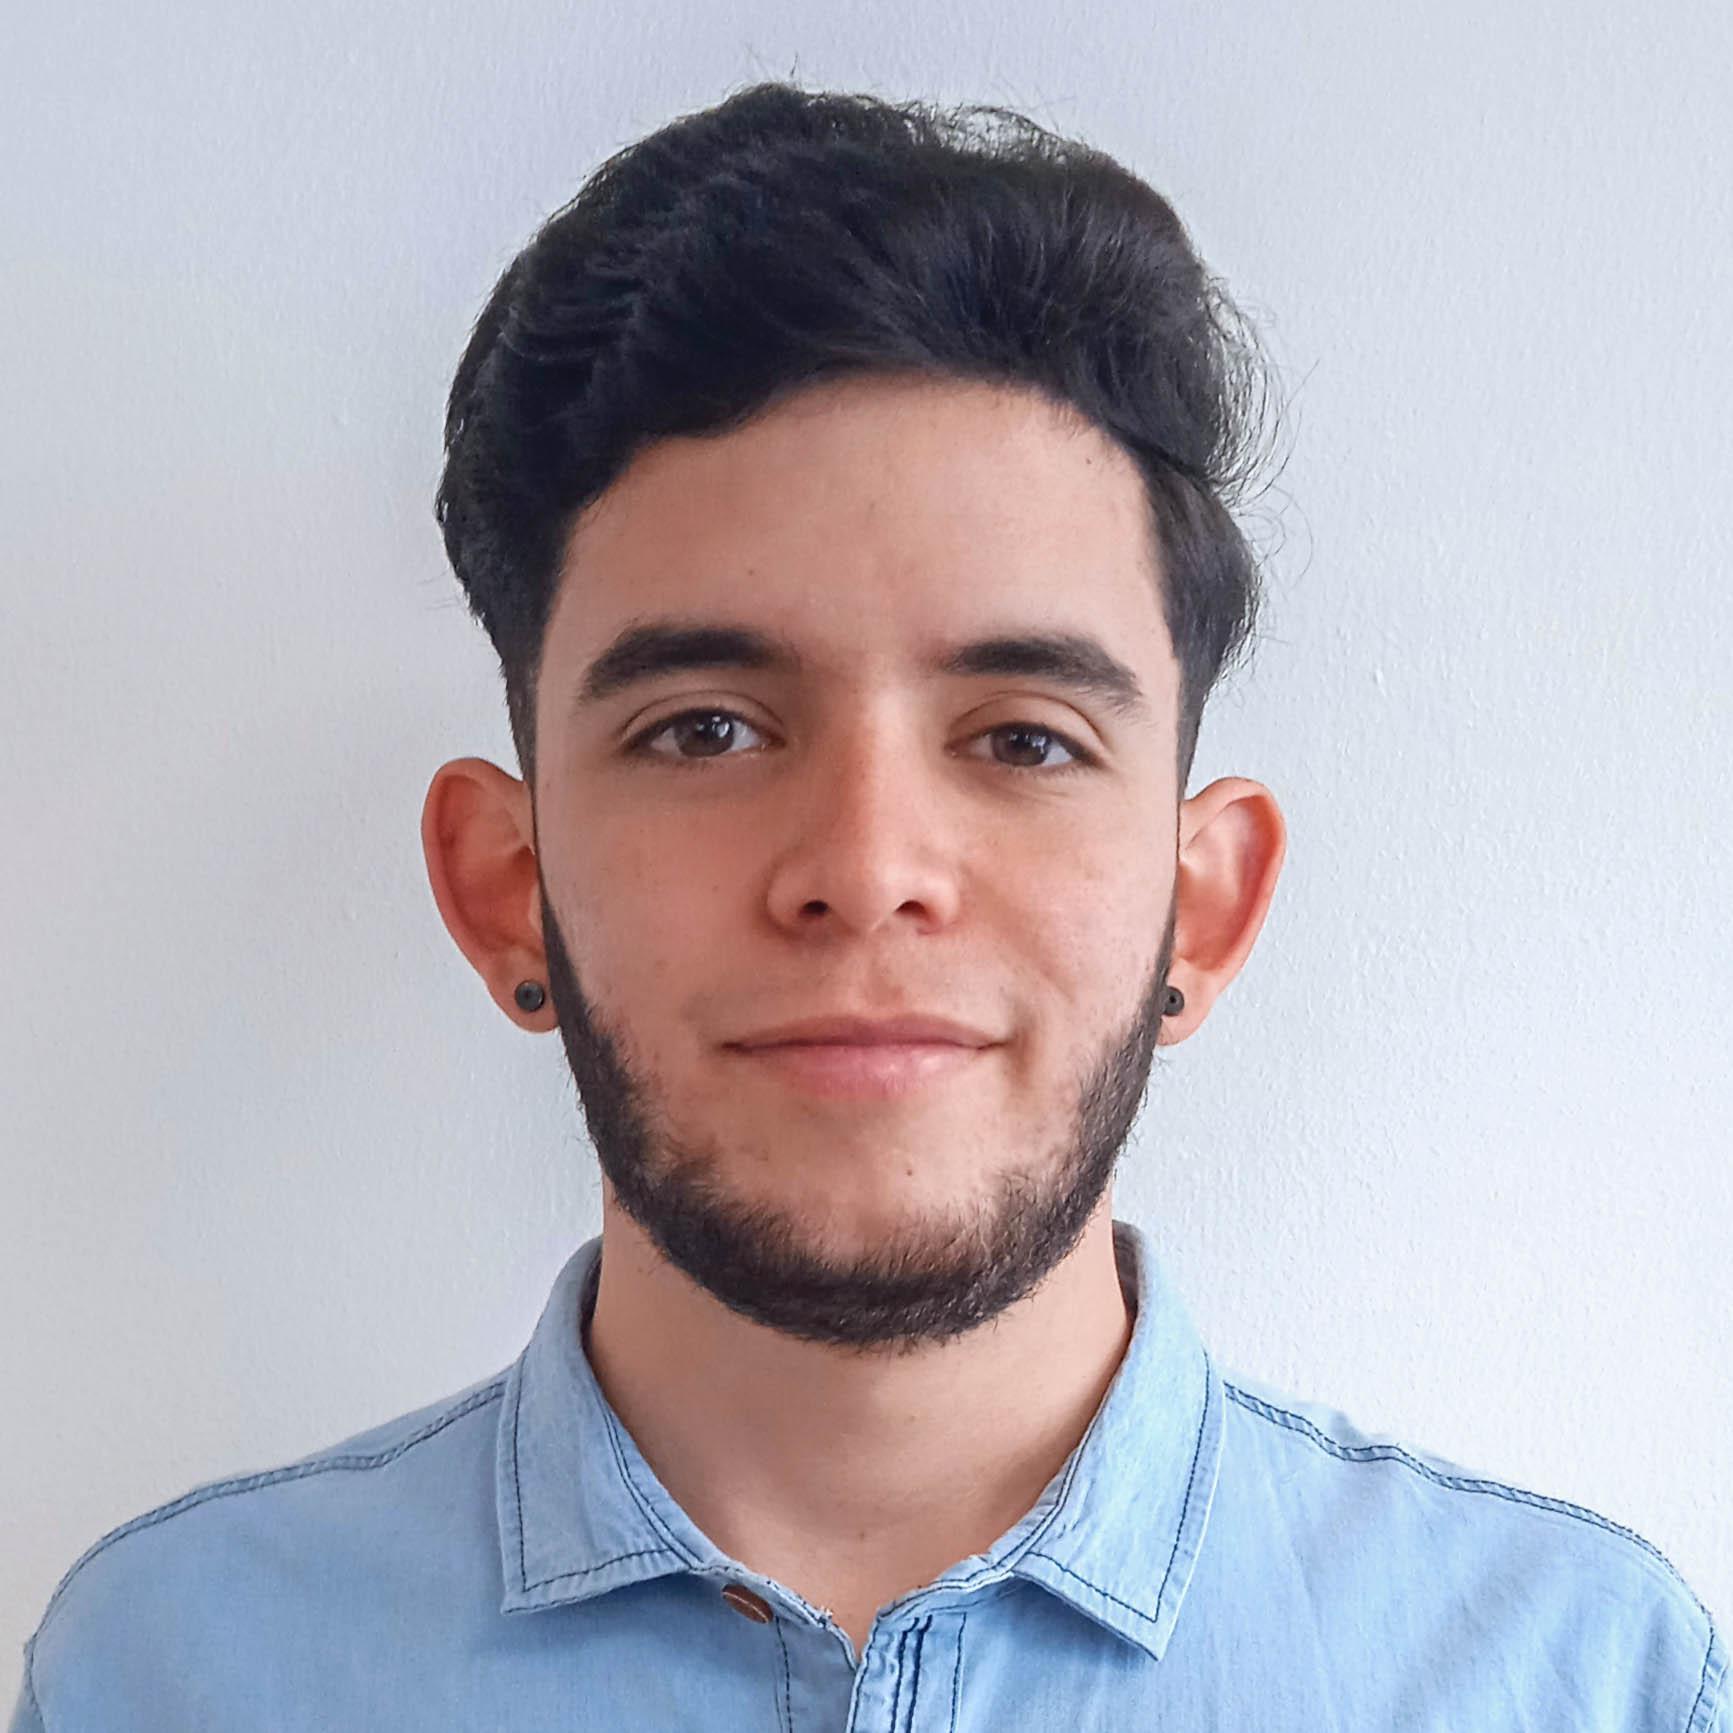 Luis Figuera